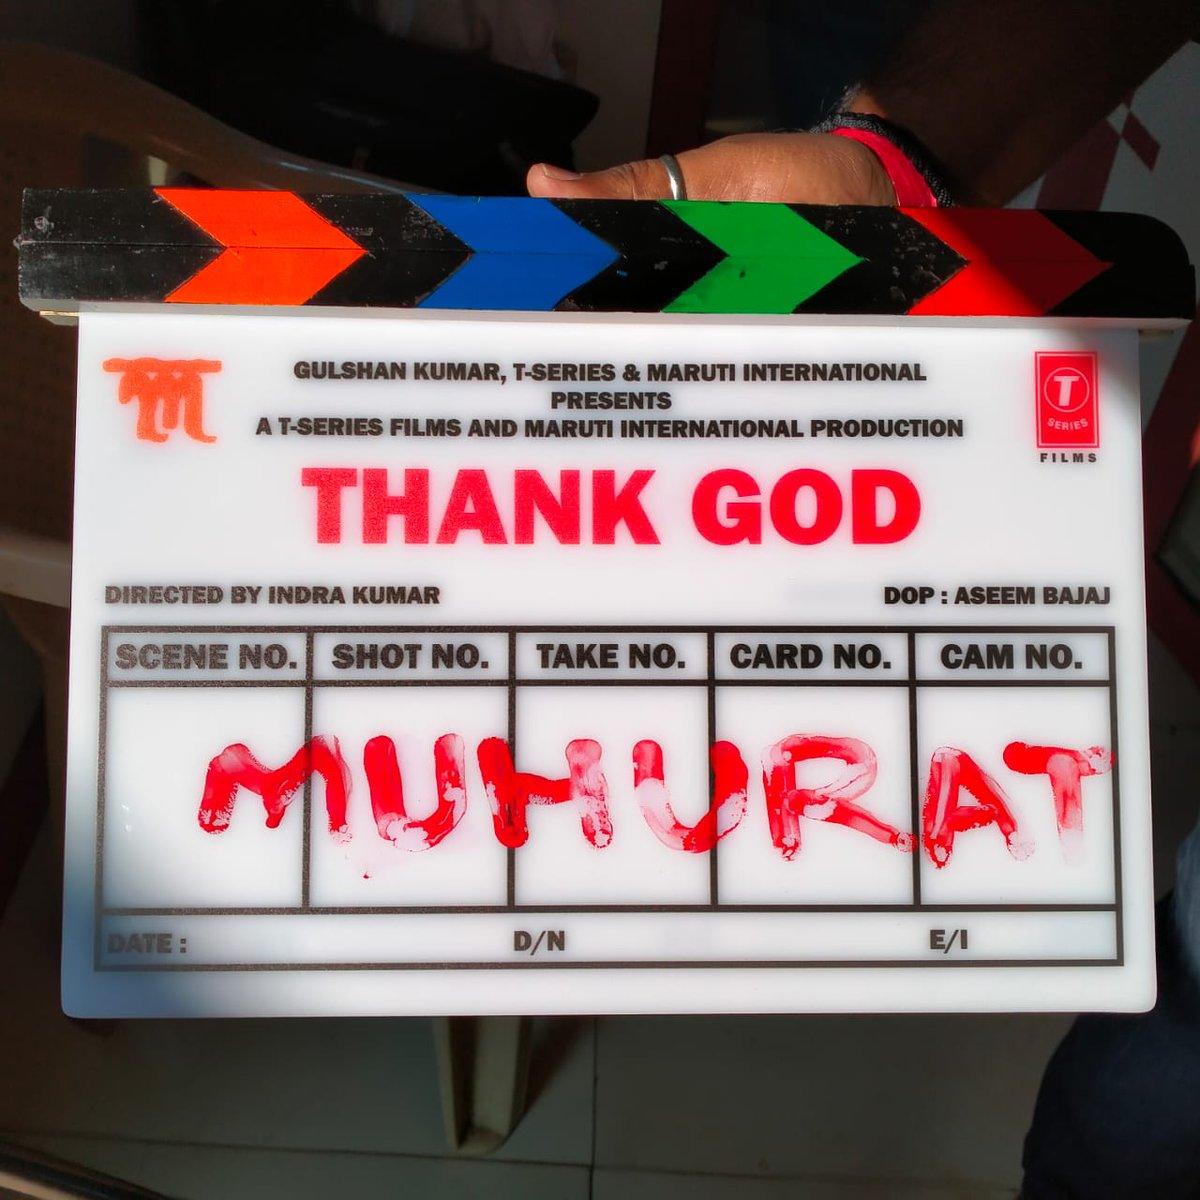 New Pics : #ThankGod Shoot begins Today in Mumbai 🎬🎥  @ajaydevgn @SidMalhotra @Rakulpreet @Indra_kumar_9 #BhushanKumar  #KrishanKumar #AshokThakeria @SunirKheterpal @MunnangiBalu @DeepakMukut @anandpandit63 #MarkandAdhikari #YashShah @TSeries #MarutiInternational